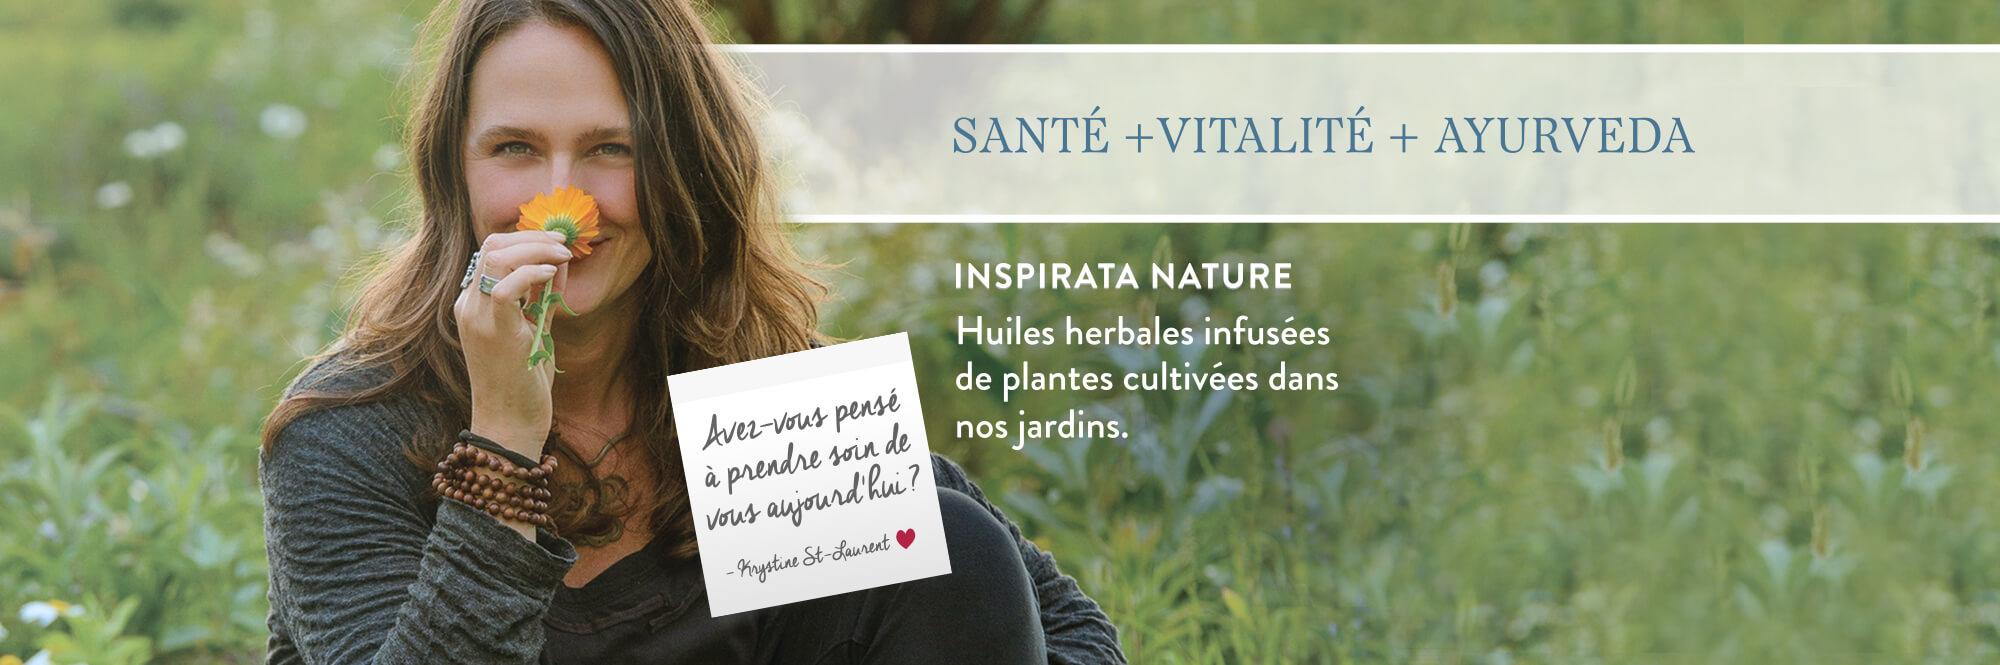 Inspirata Nature - Krystine St-Laurent